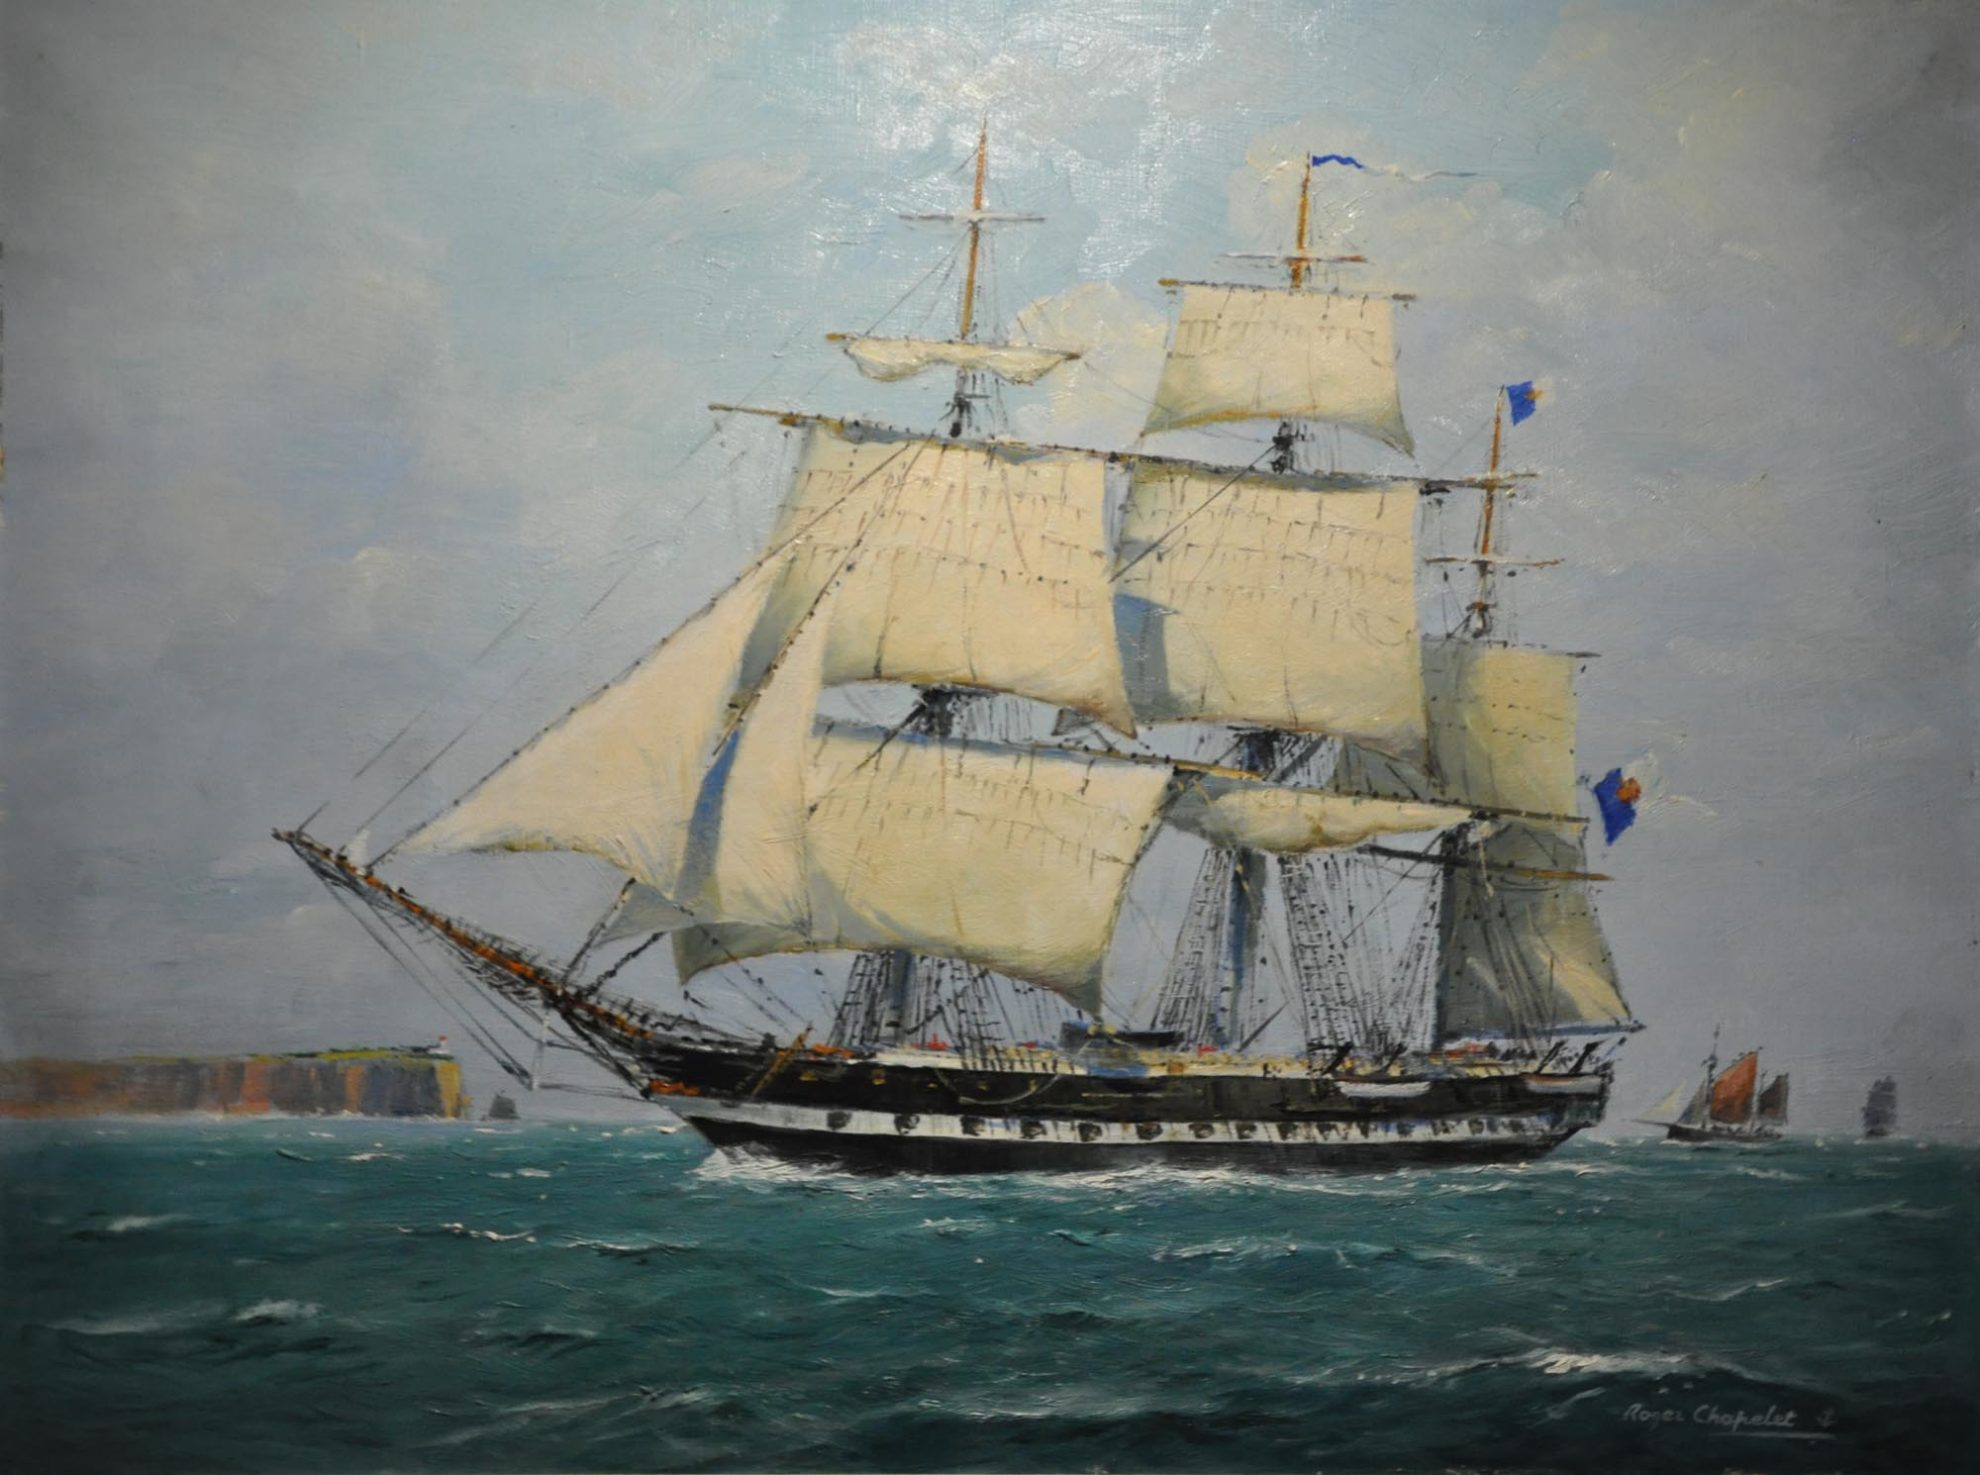 фрегат «Дон Фернанду»